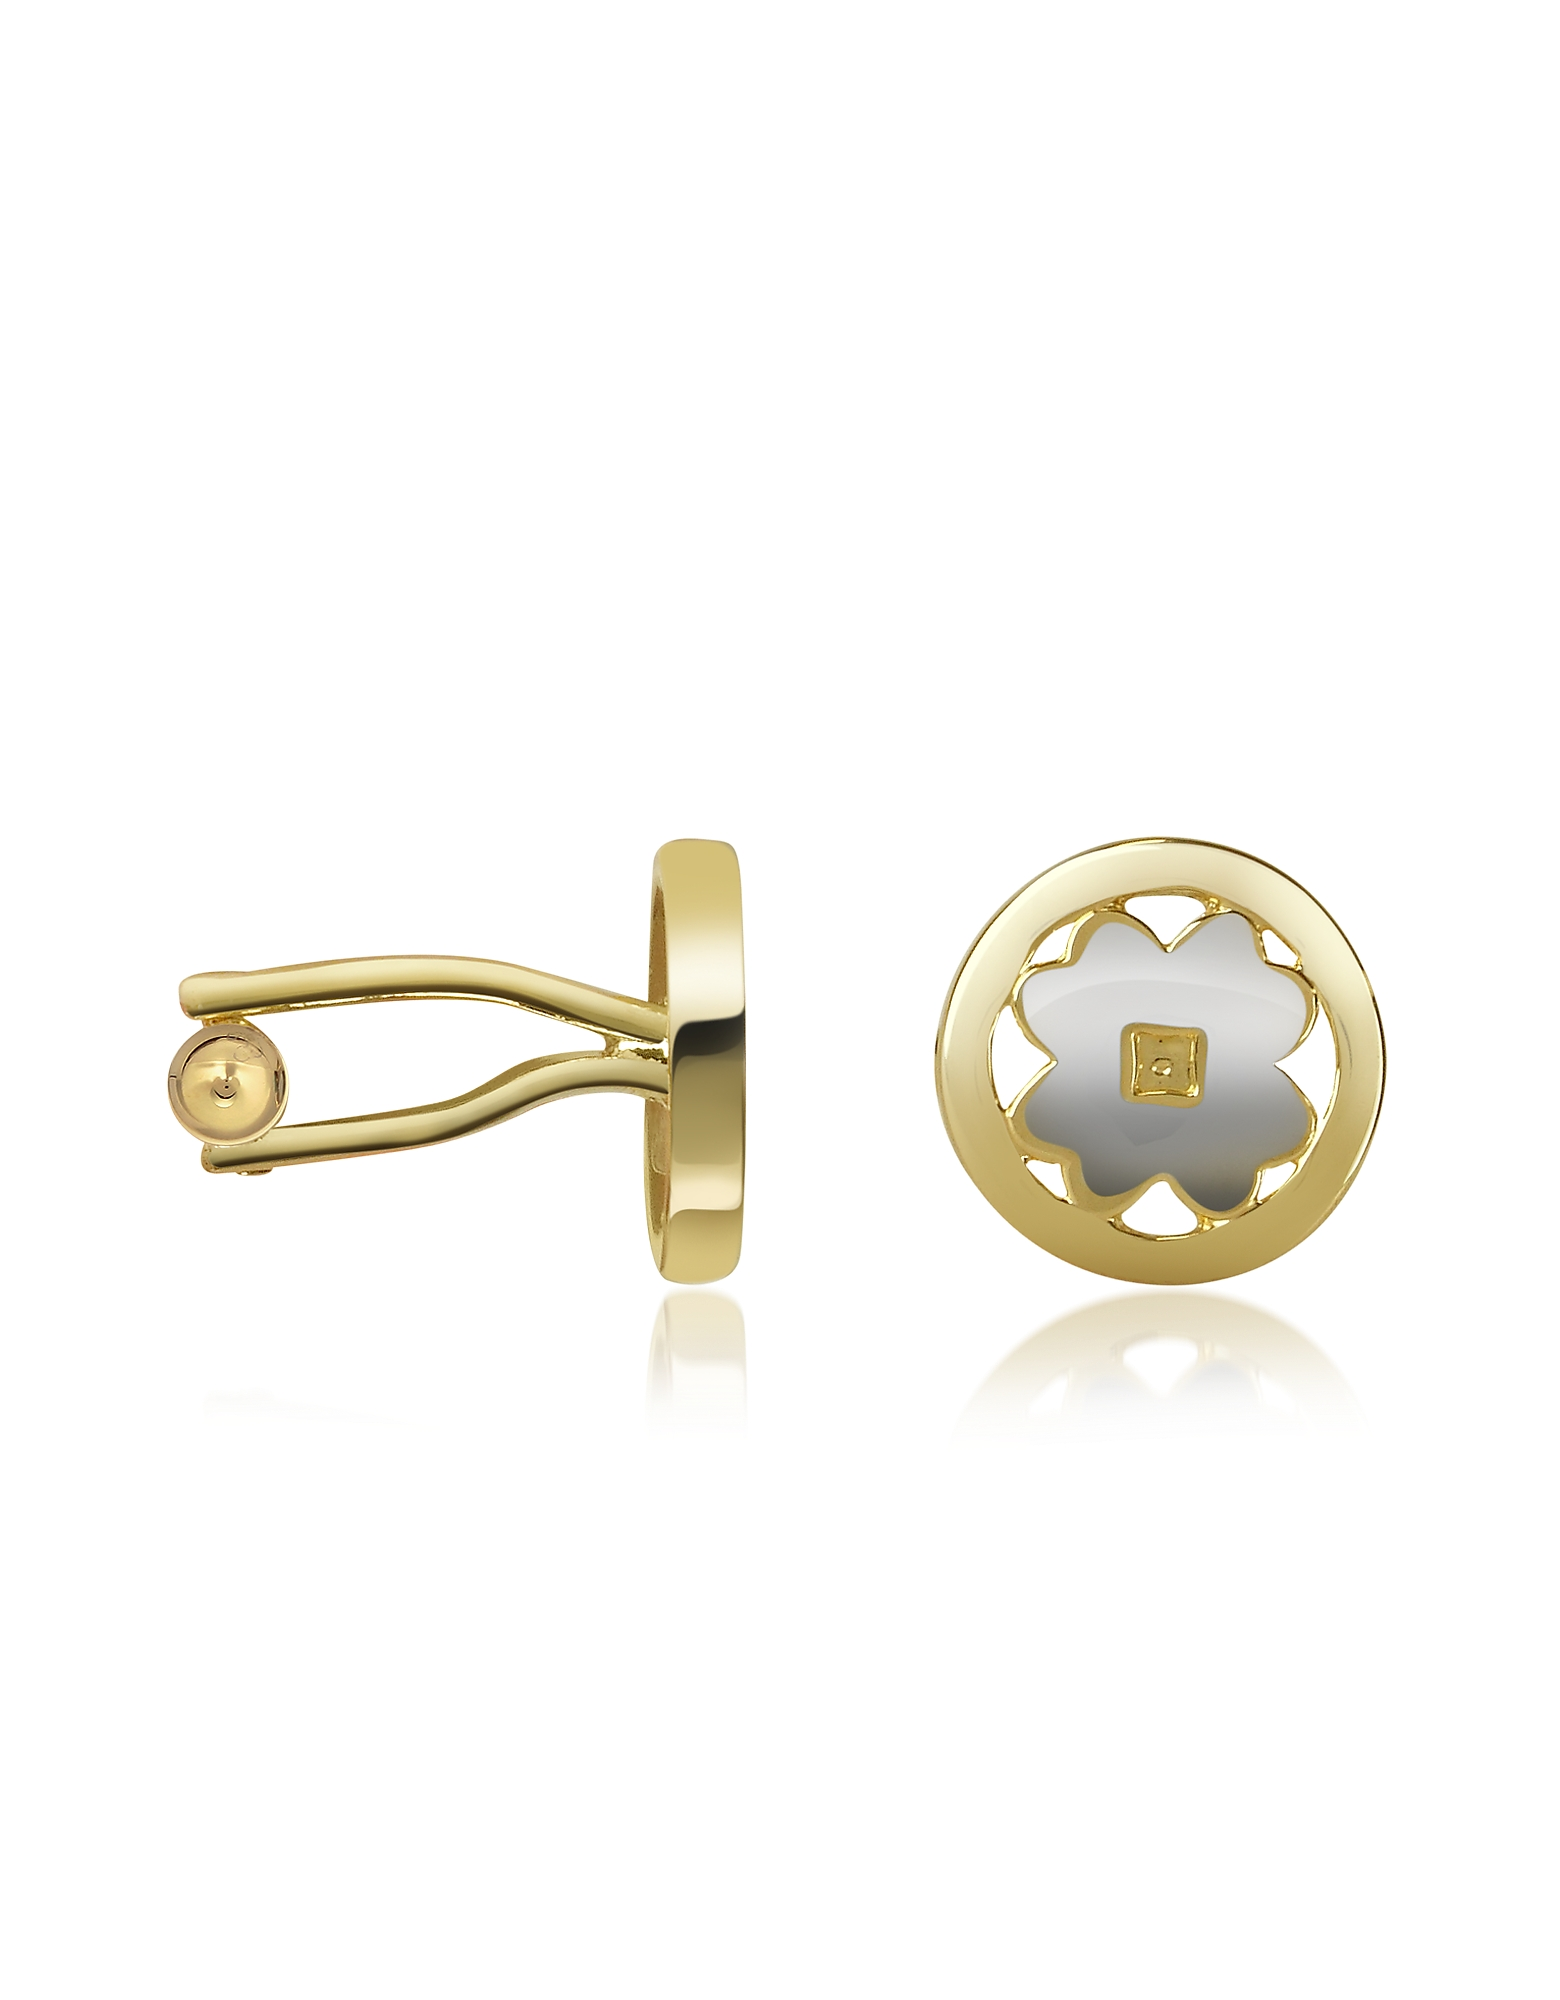 AZ Collection Cufflinks, Four-Leaf Clover Gold Plated Cuff Links